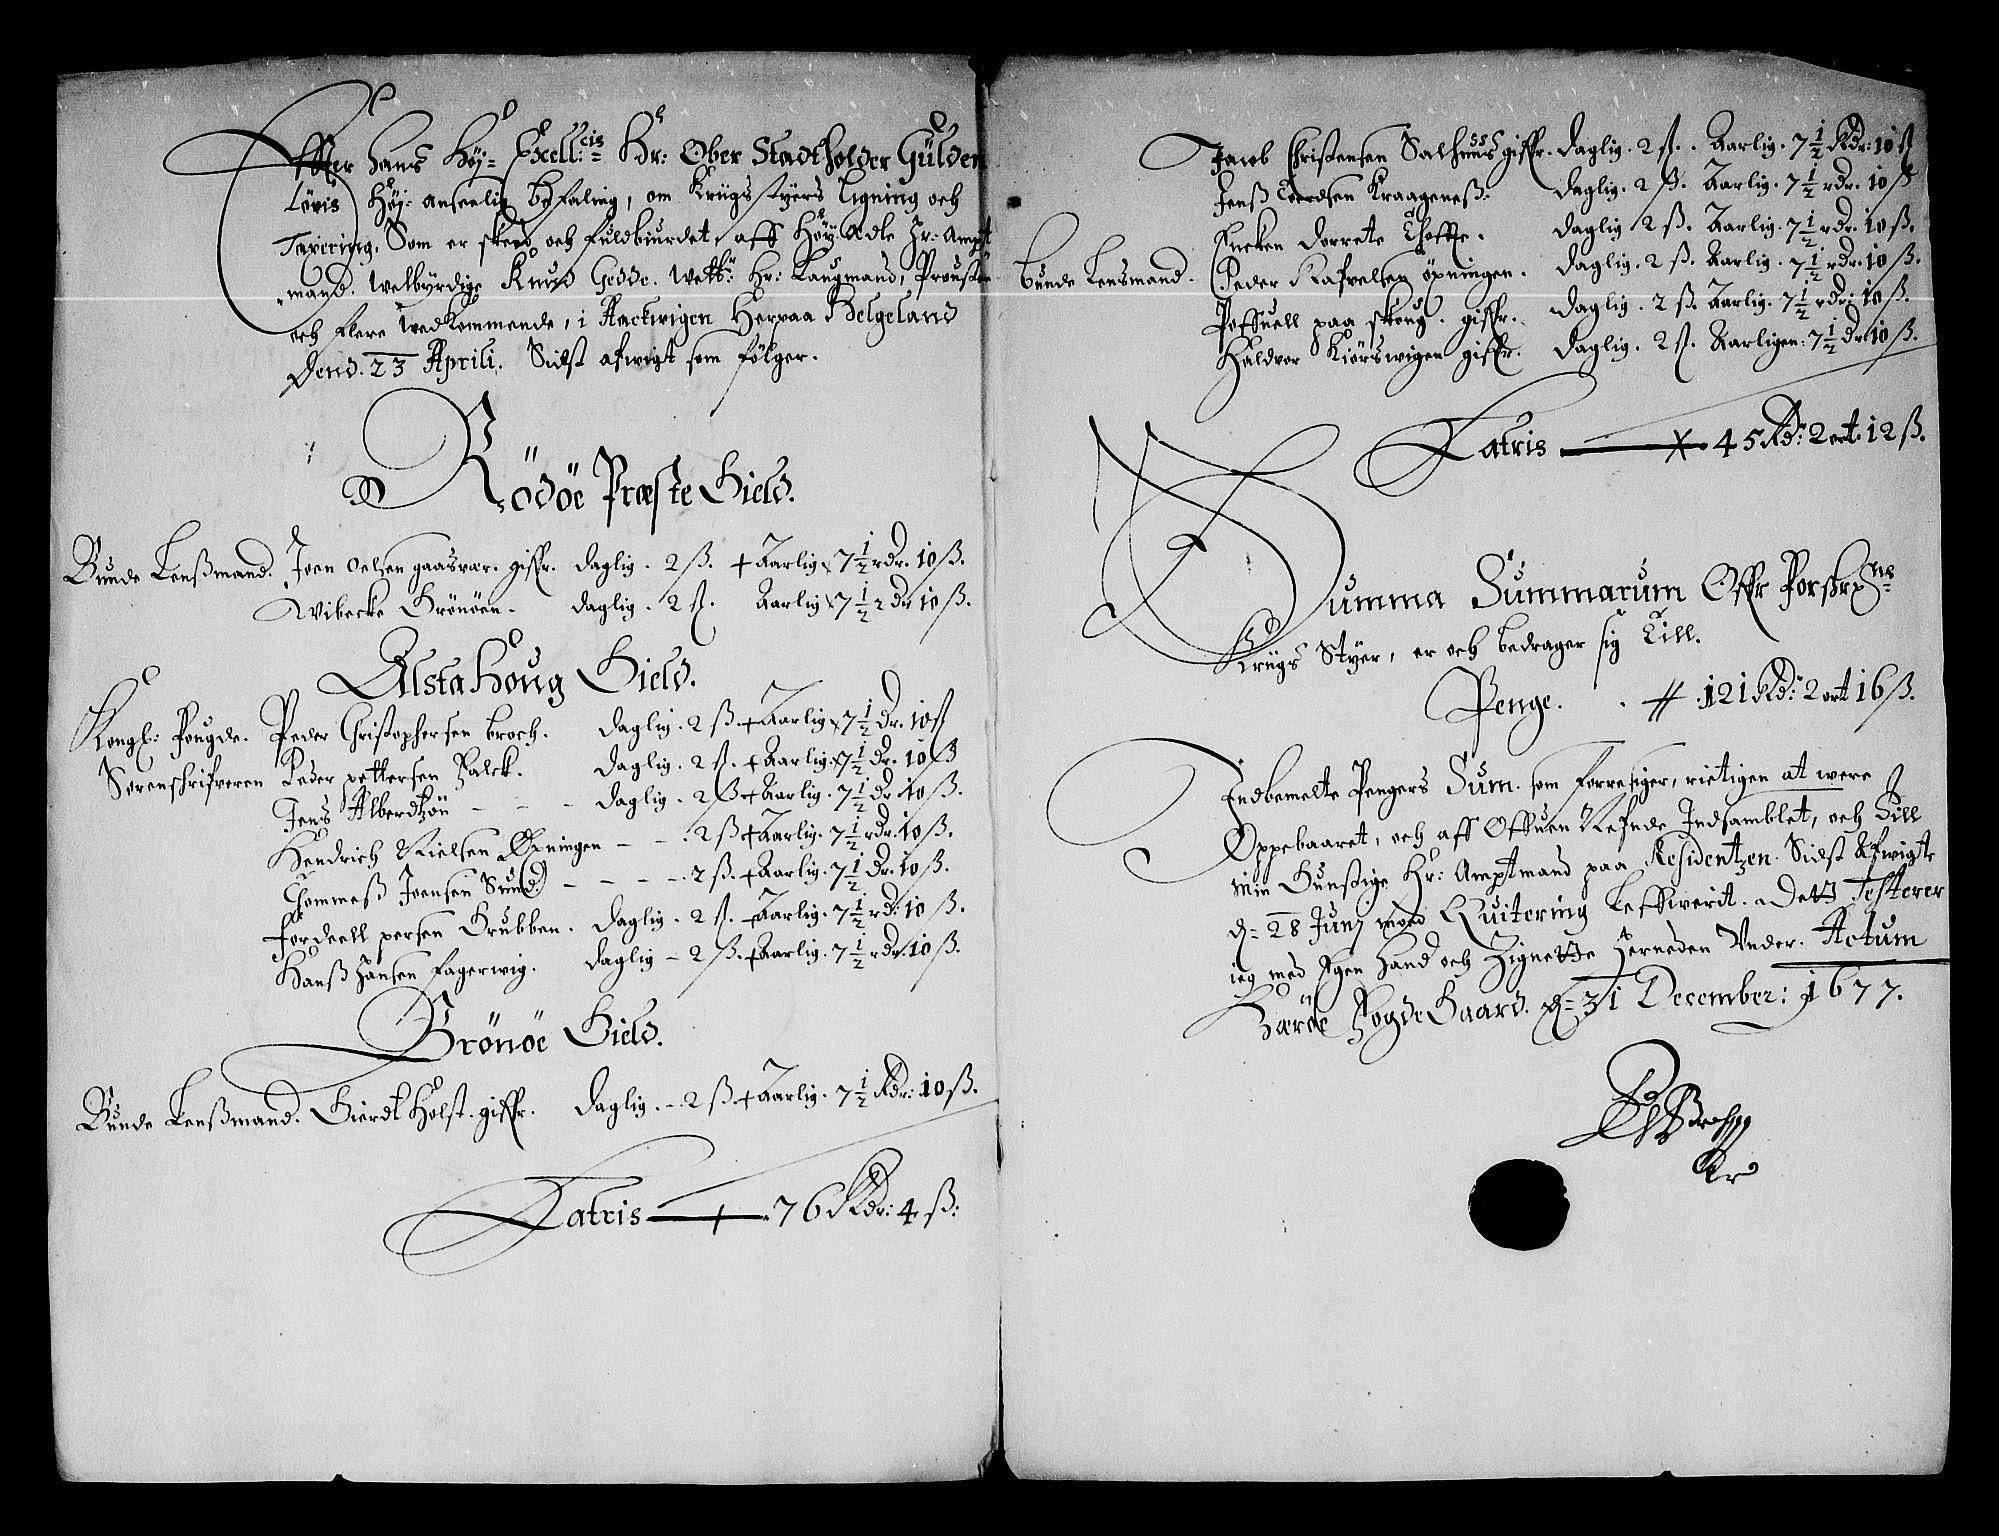 RA, Rentekammeret inntil 1814, Reviderte regnskaper, Stiftamtstueregnskaper, Trondheim stiftamt og Nordland amt, R/Re/L0049: Trondheim stiftamt og Nordland amt, 1677